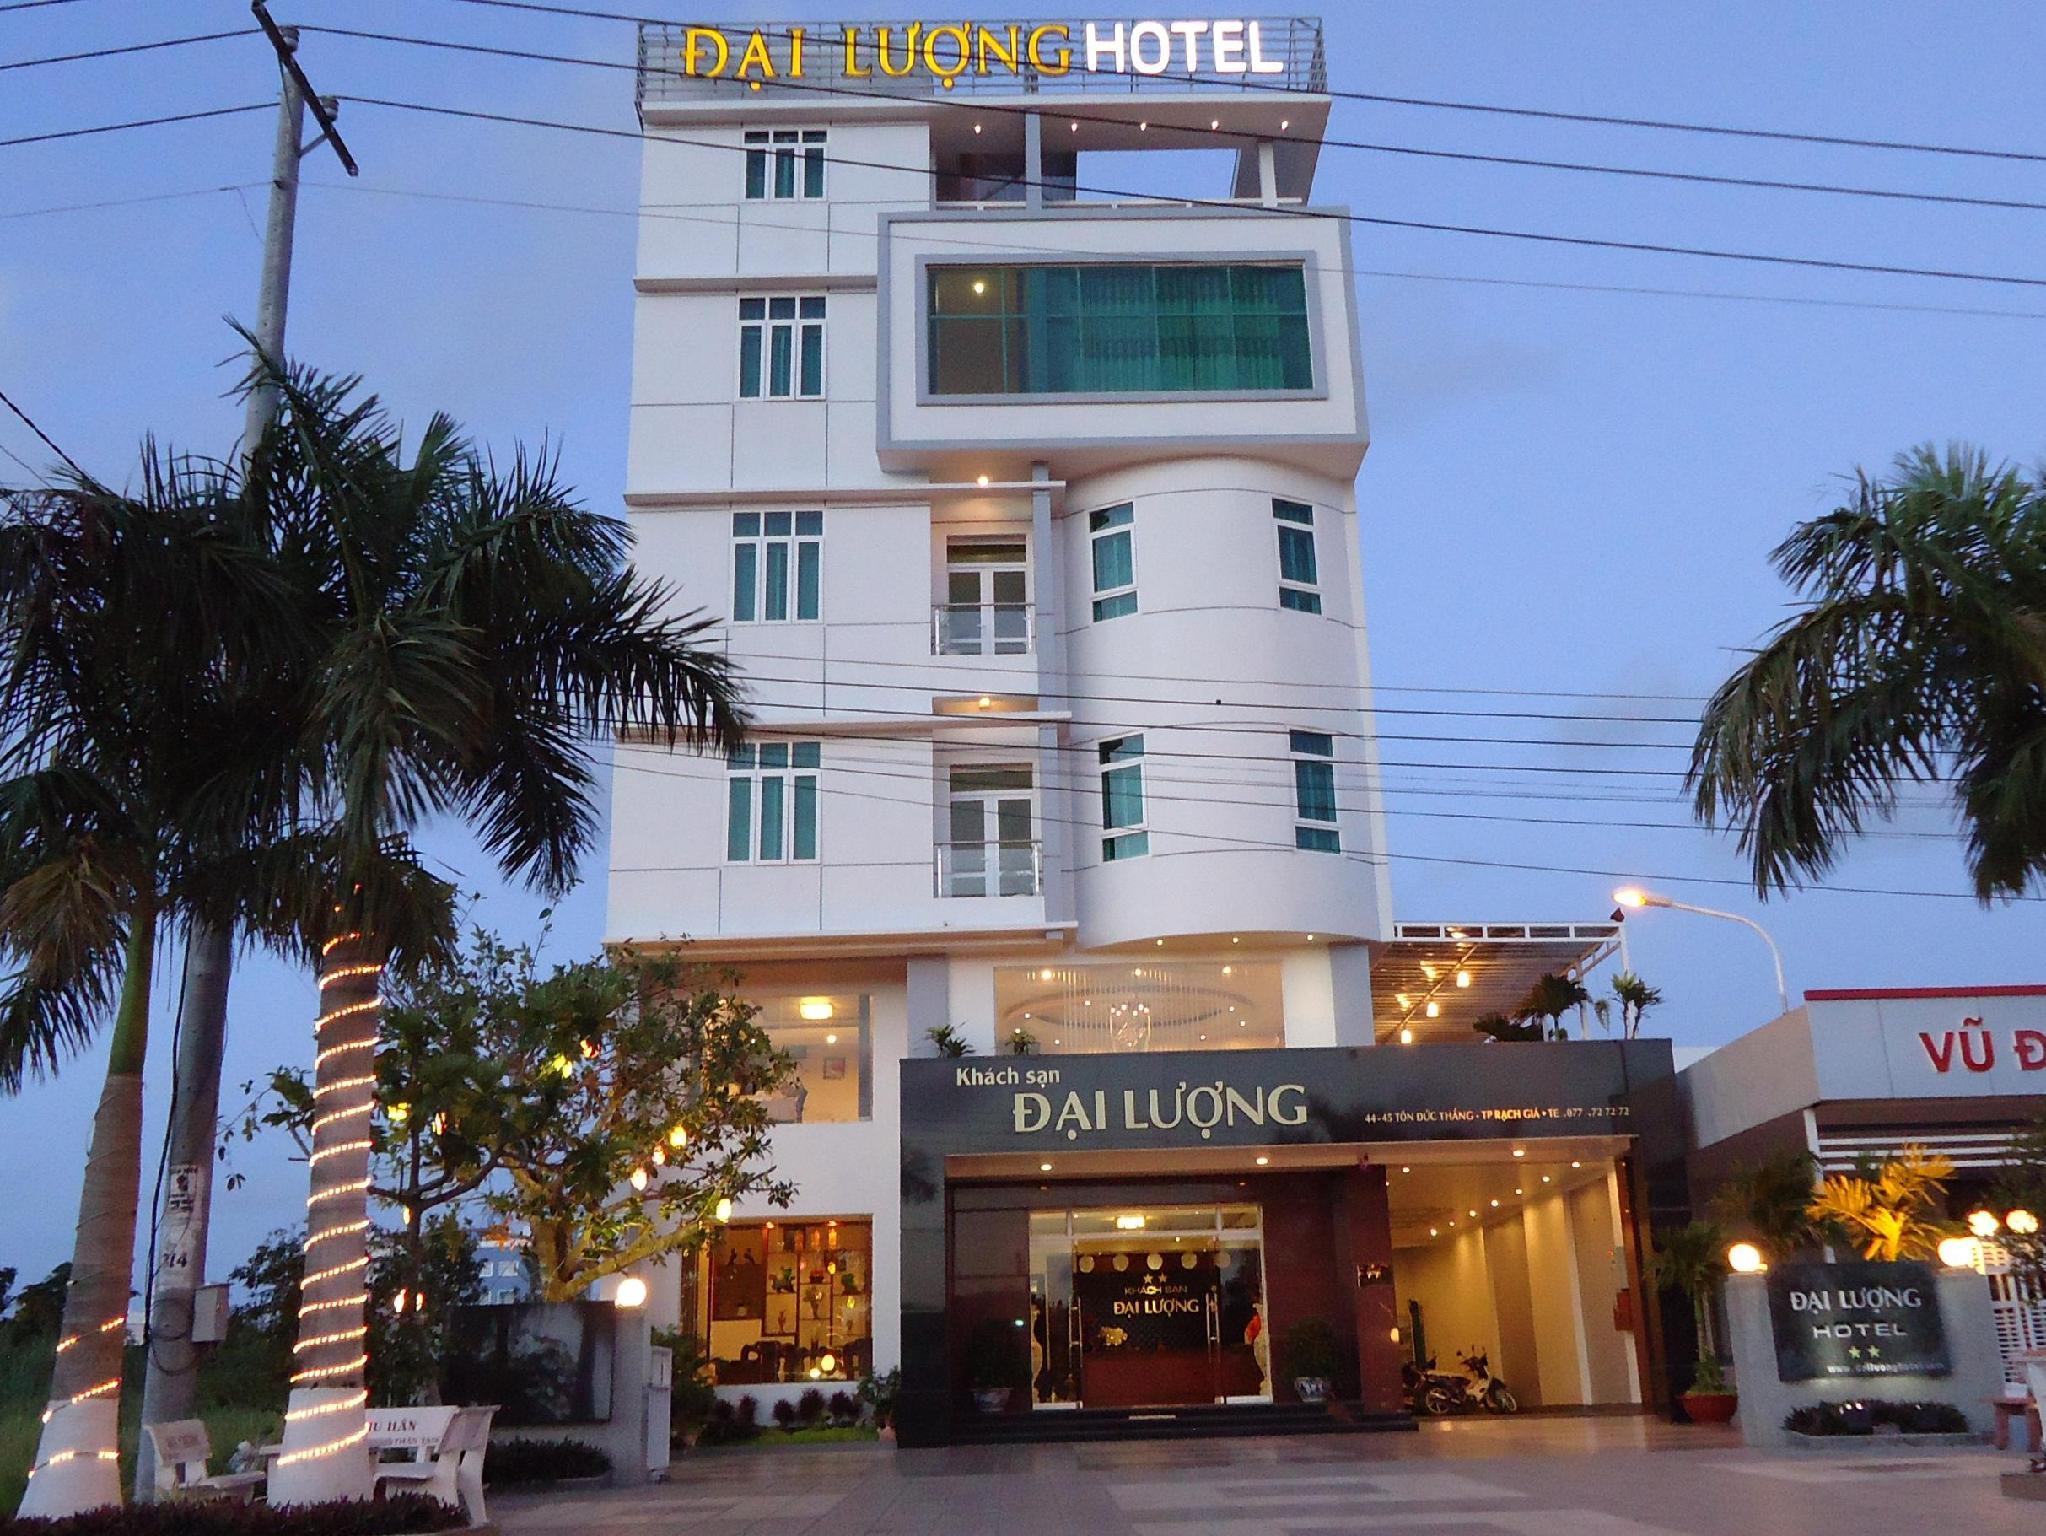 Dai Luong Hotel - Hotell och Boende i Vietnam , Rach Gia (Kien Giang)